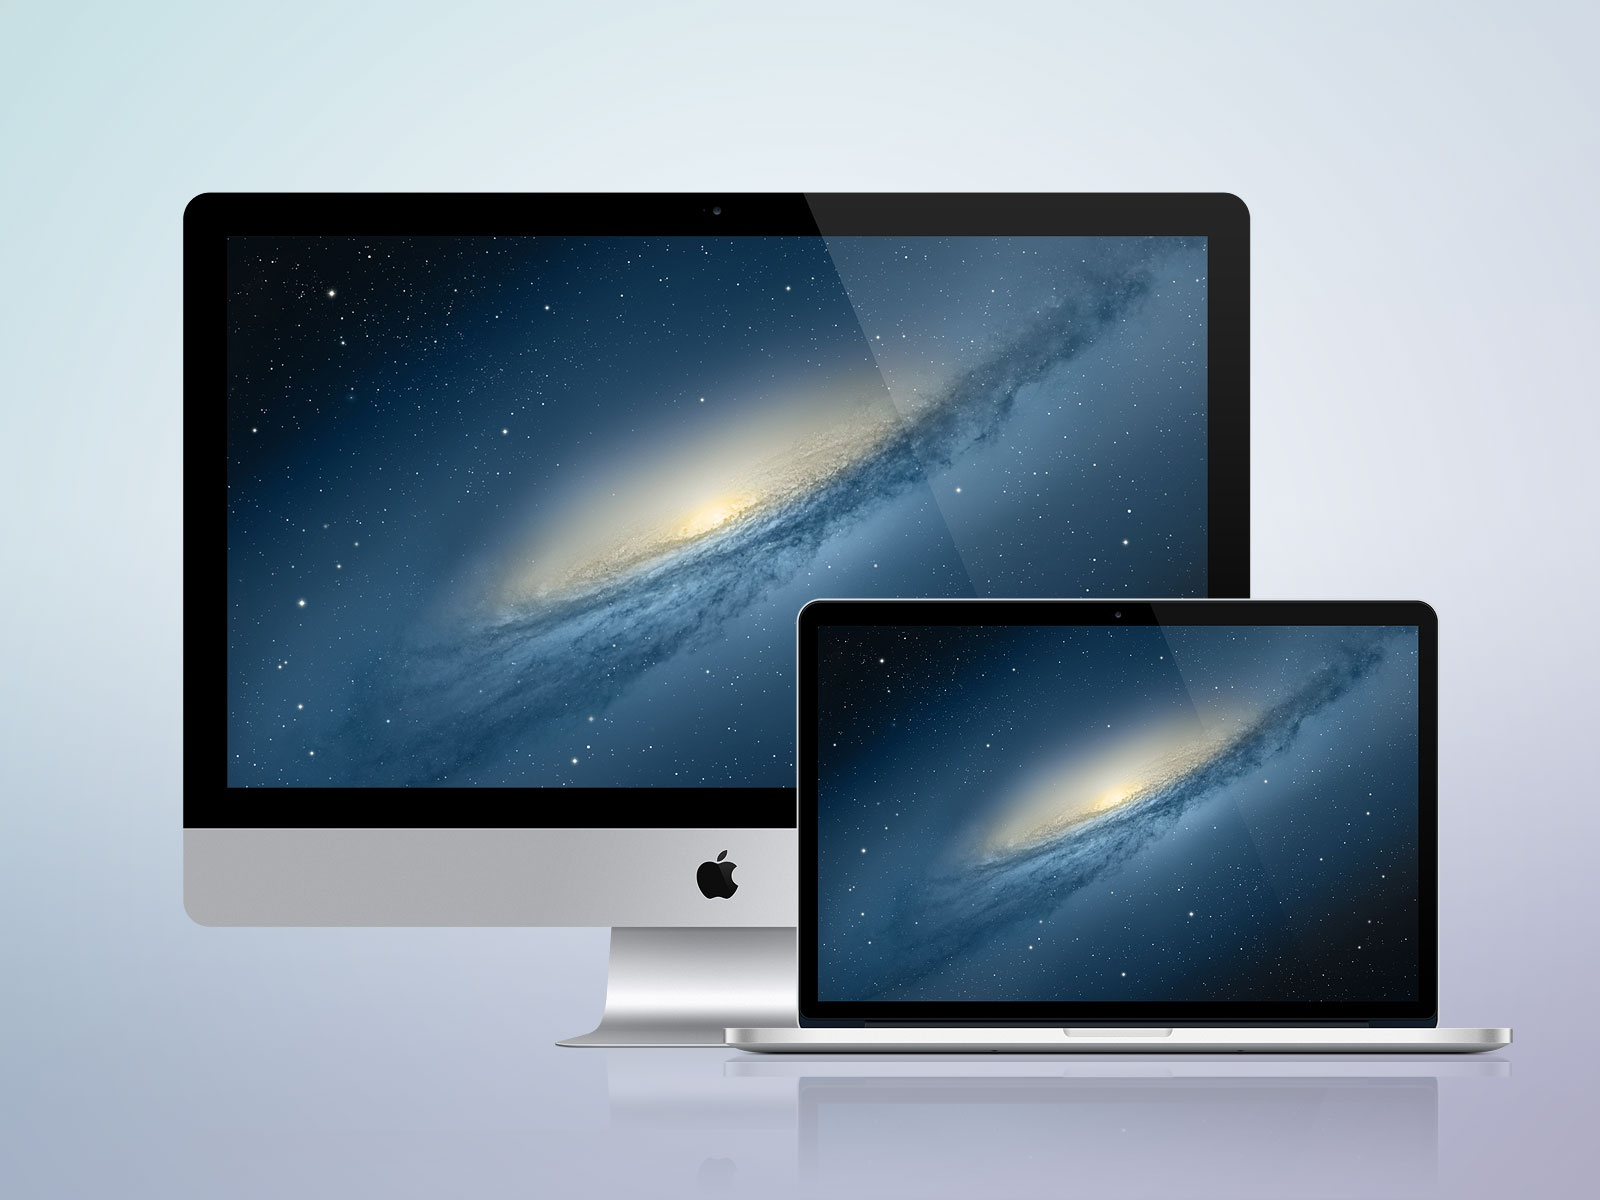 Imac macbook big preview